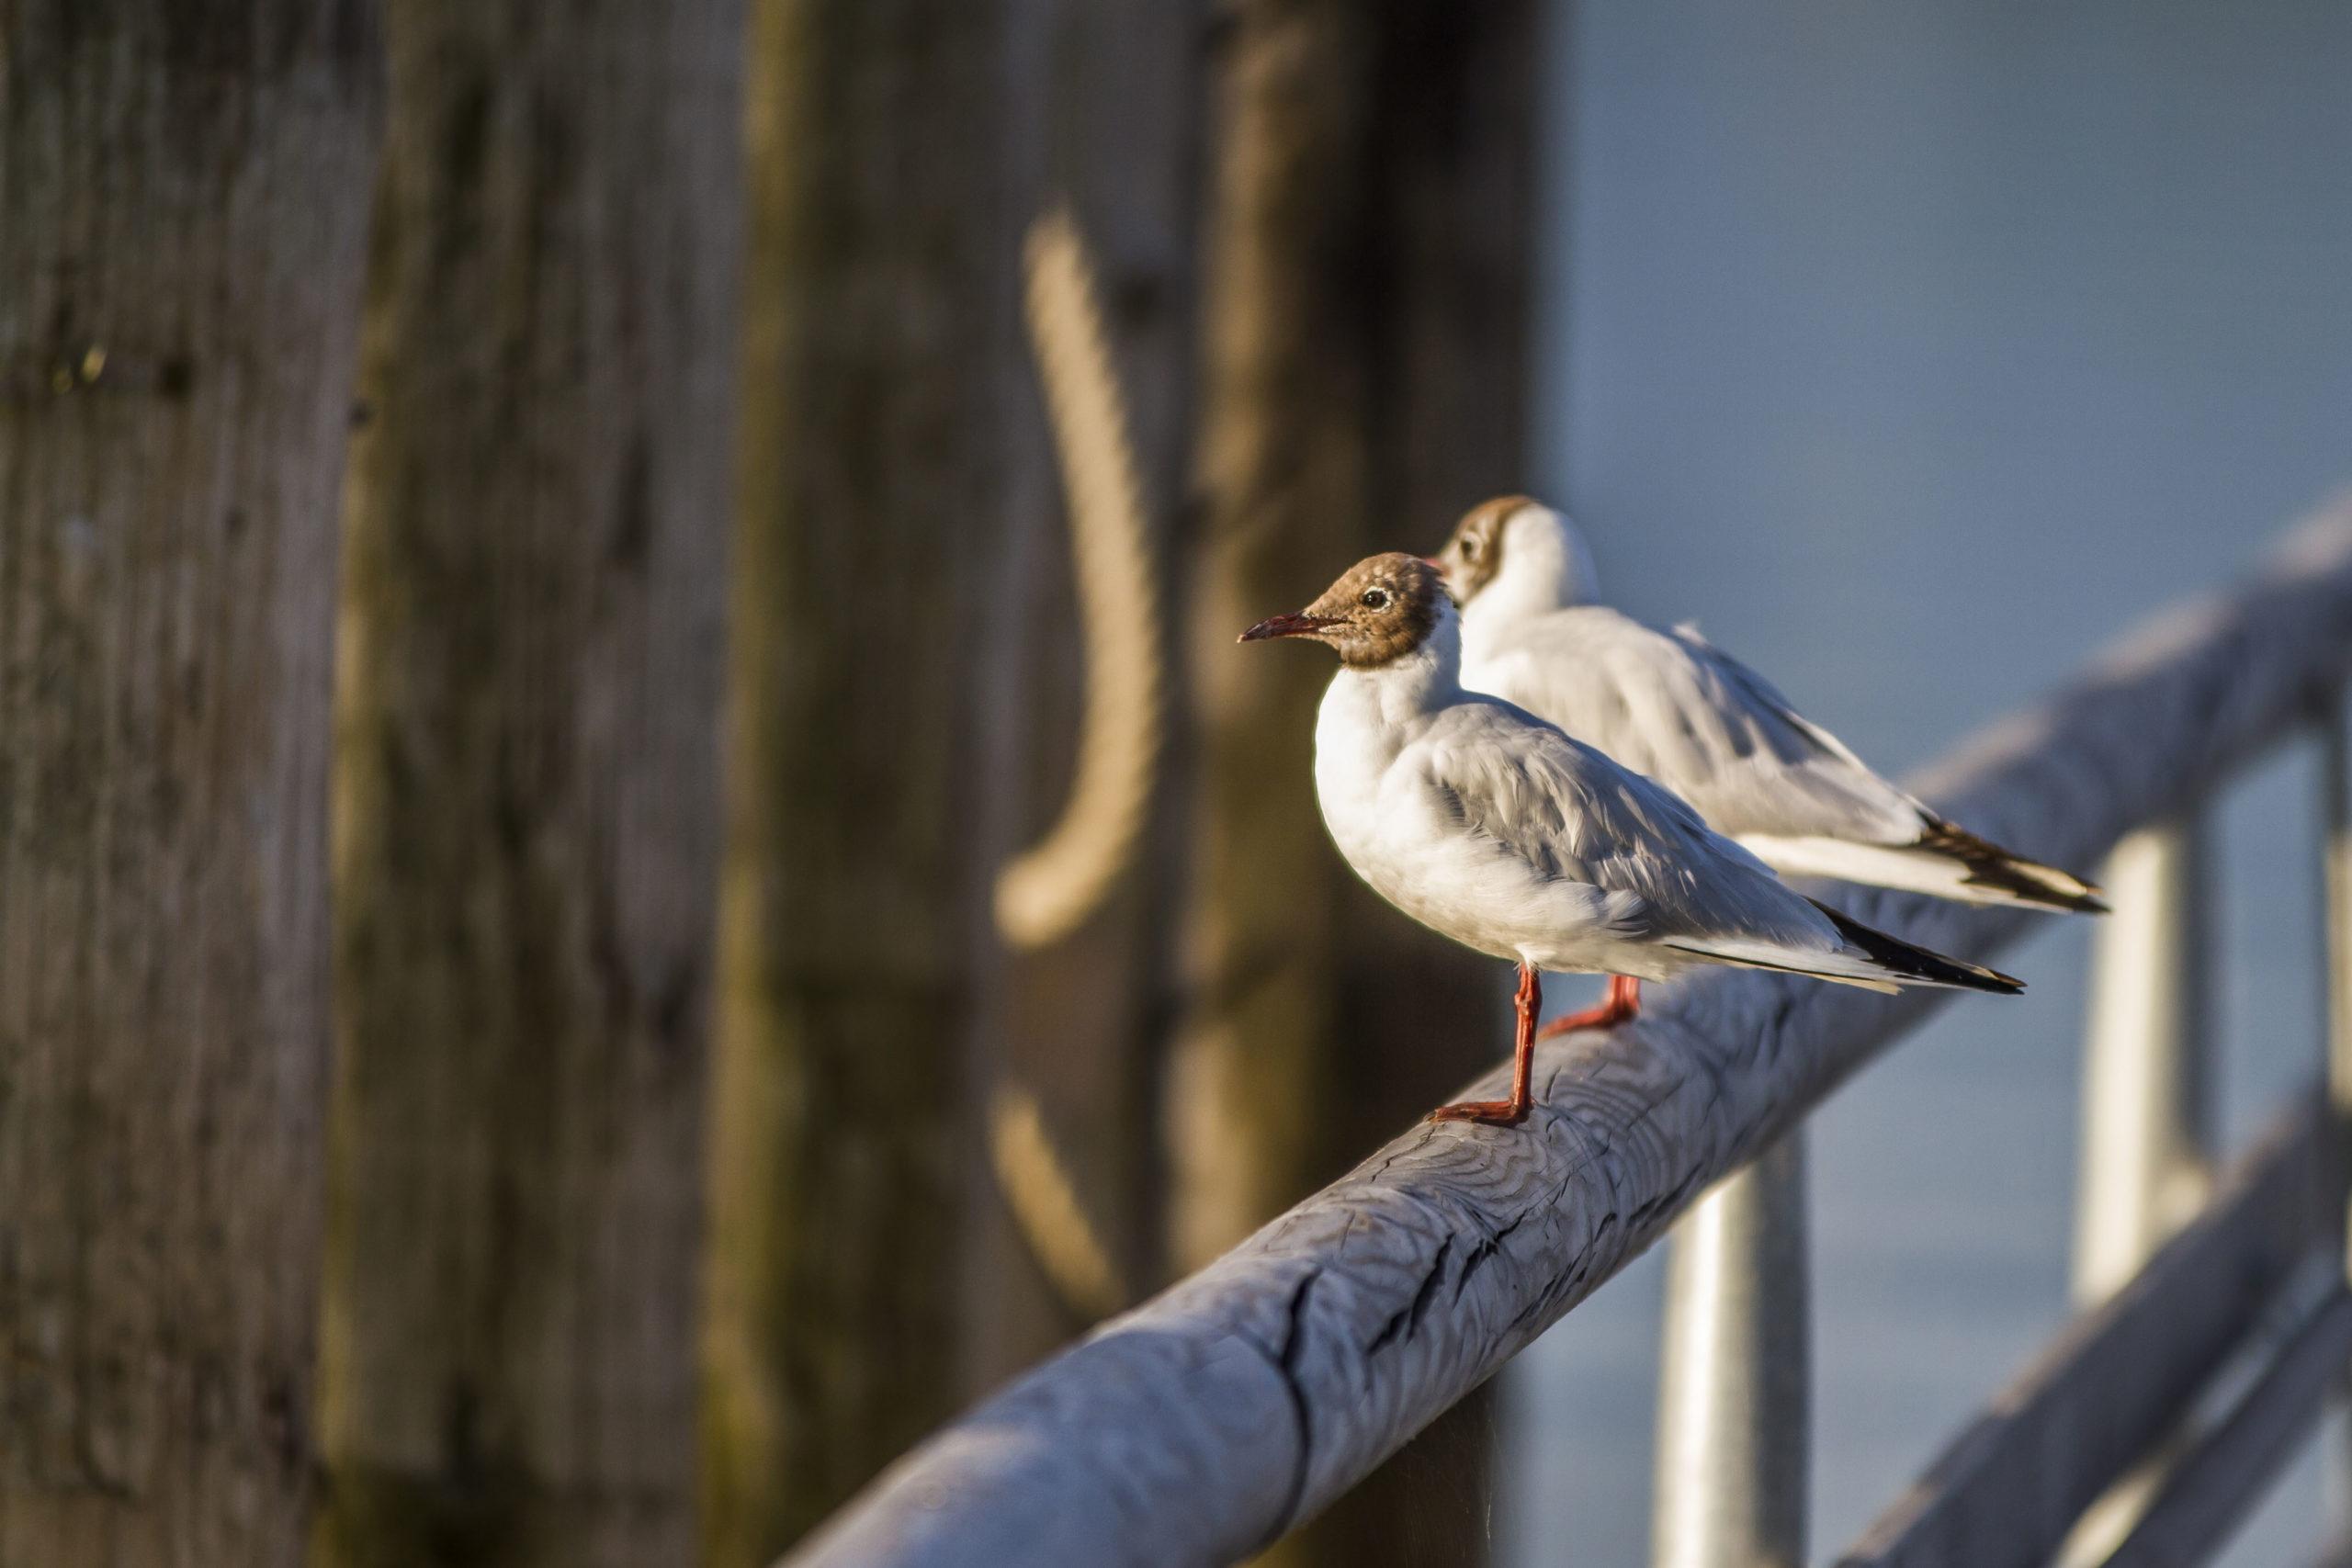 Naturfotografie im Chiemgau